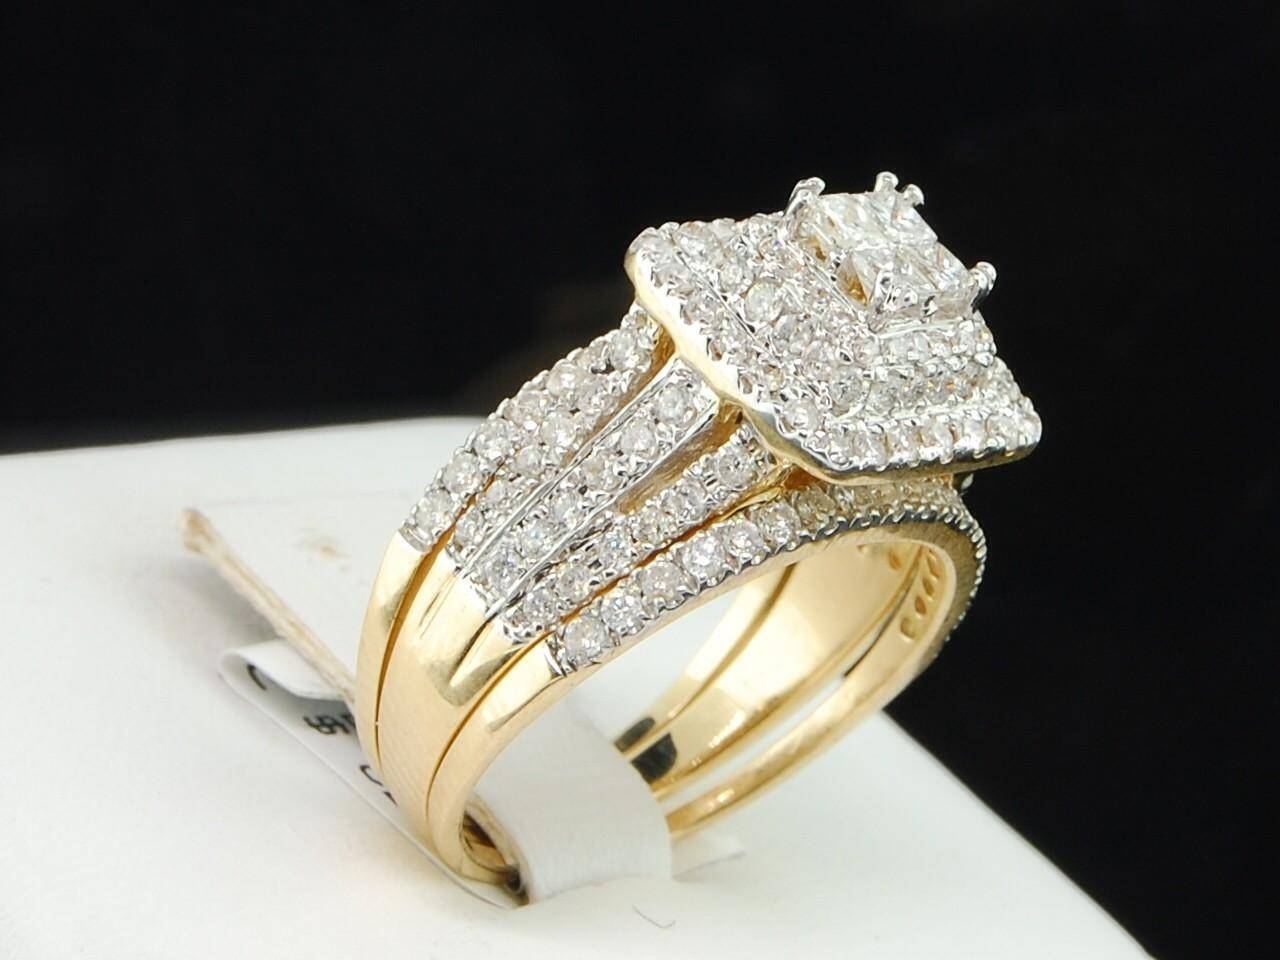 Engagement Rings For Women Cheap Walmart 3 – Ifec Ci With Regard To Walmart Wedding Rings For Women (View 9 of 15)